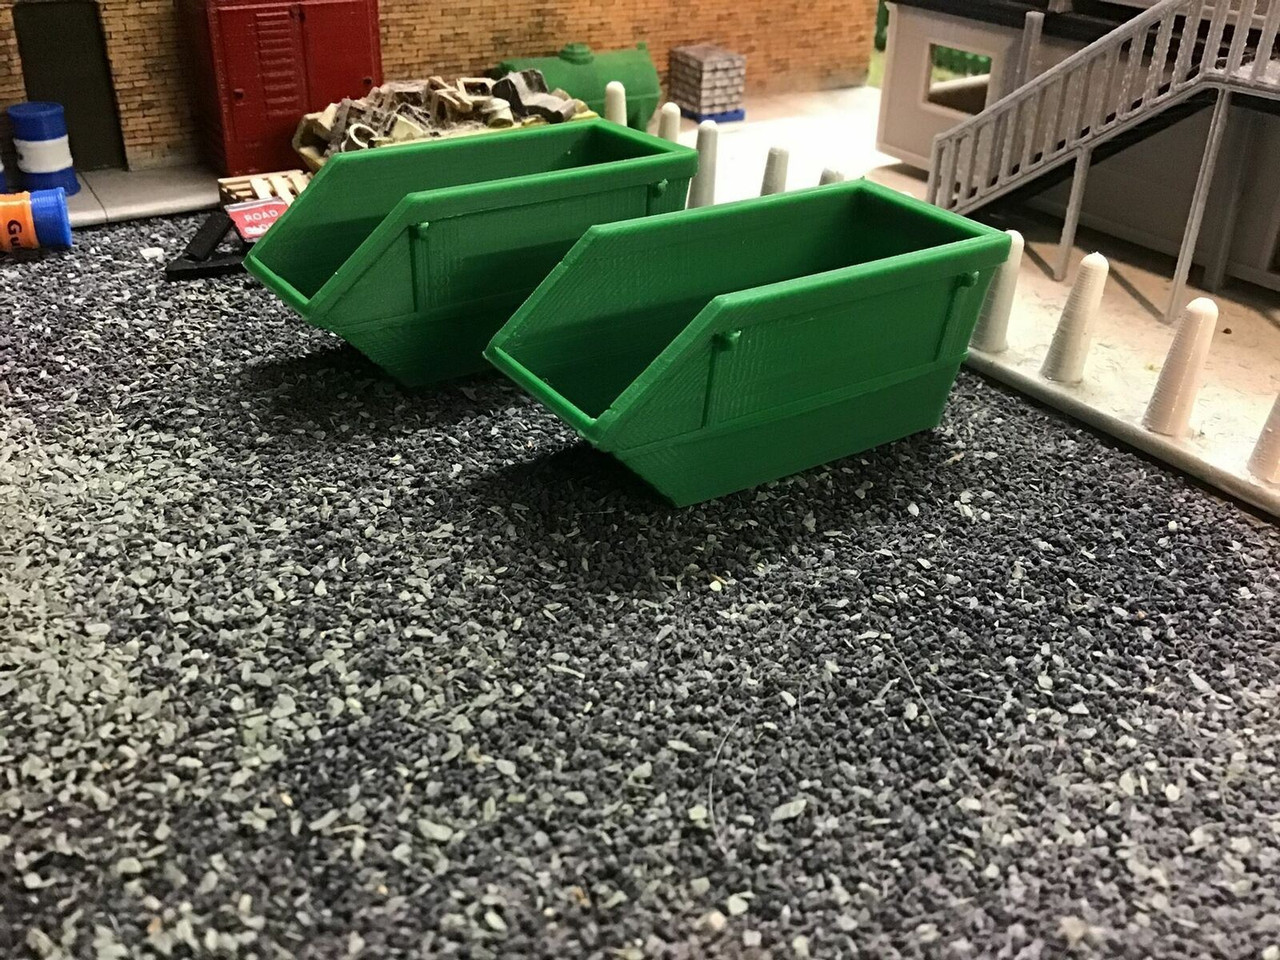 1.76 3D Printed 16 yrd Skip,Green 2 Pack